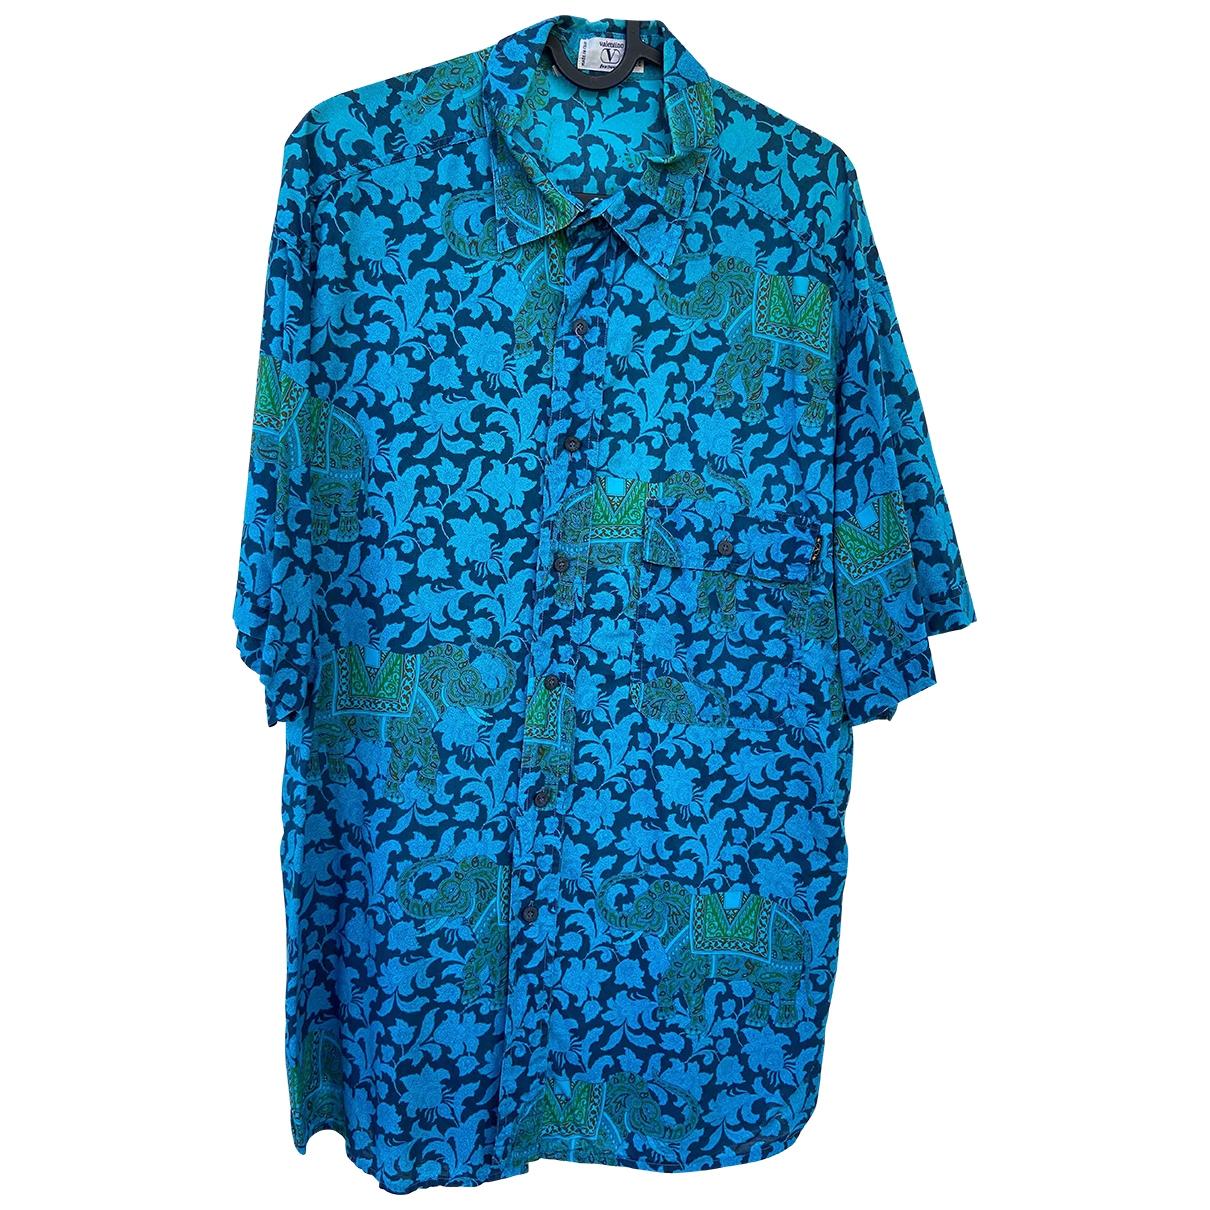 Valentino Garavani \N Blue Cotton Shirts for Men 43 EU (tour de cou / collar)